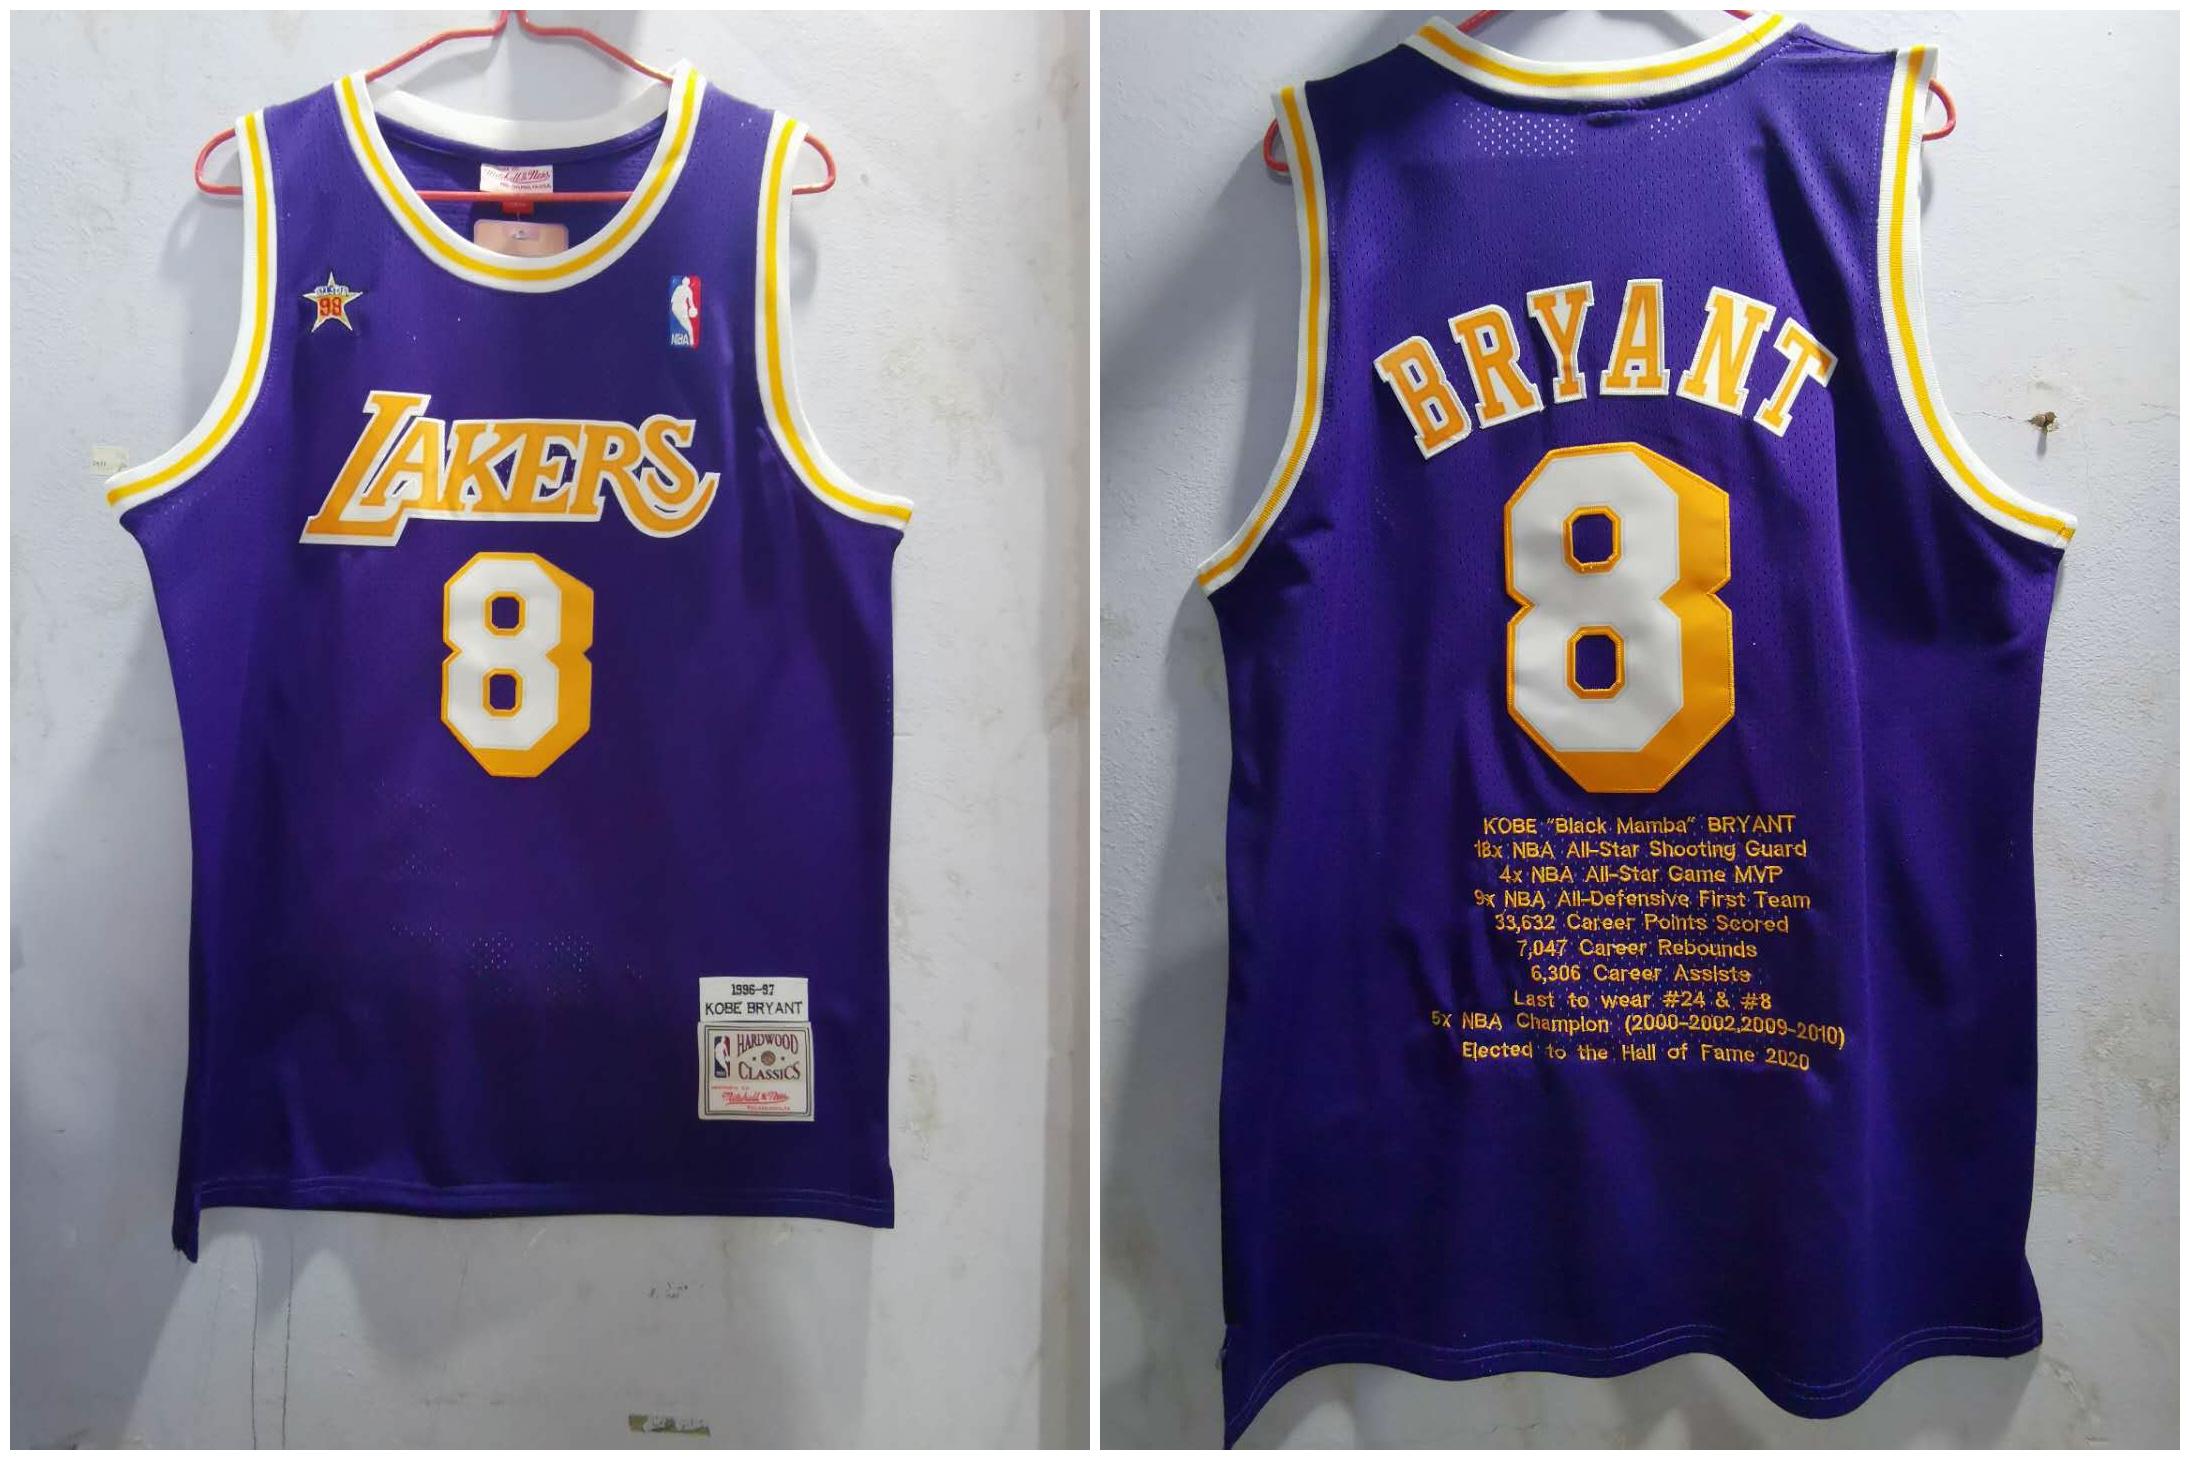 Lakers 8 Kobe Bryant Purple 1996-97 Hardwood Classics Jersey